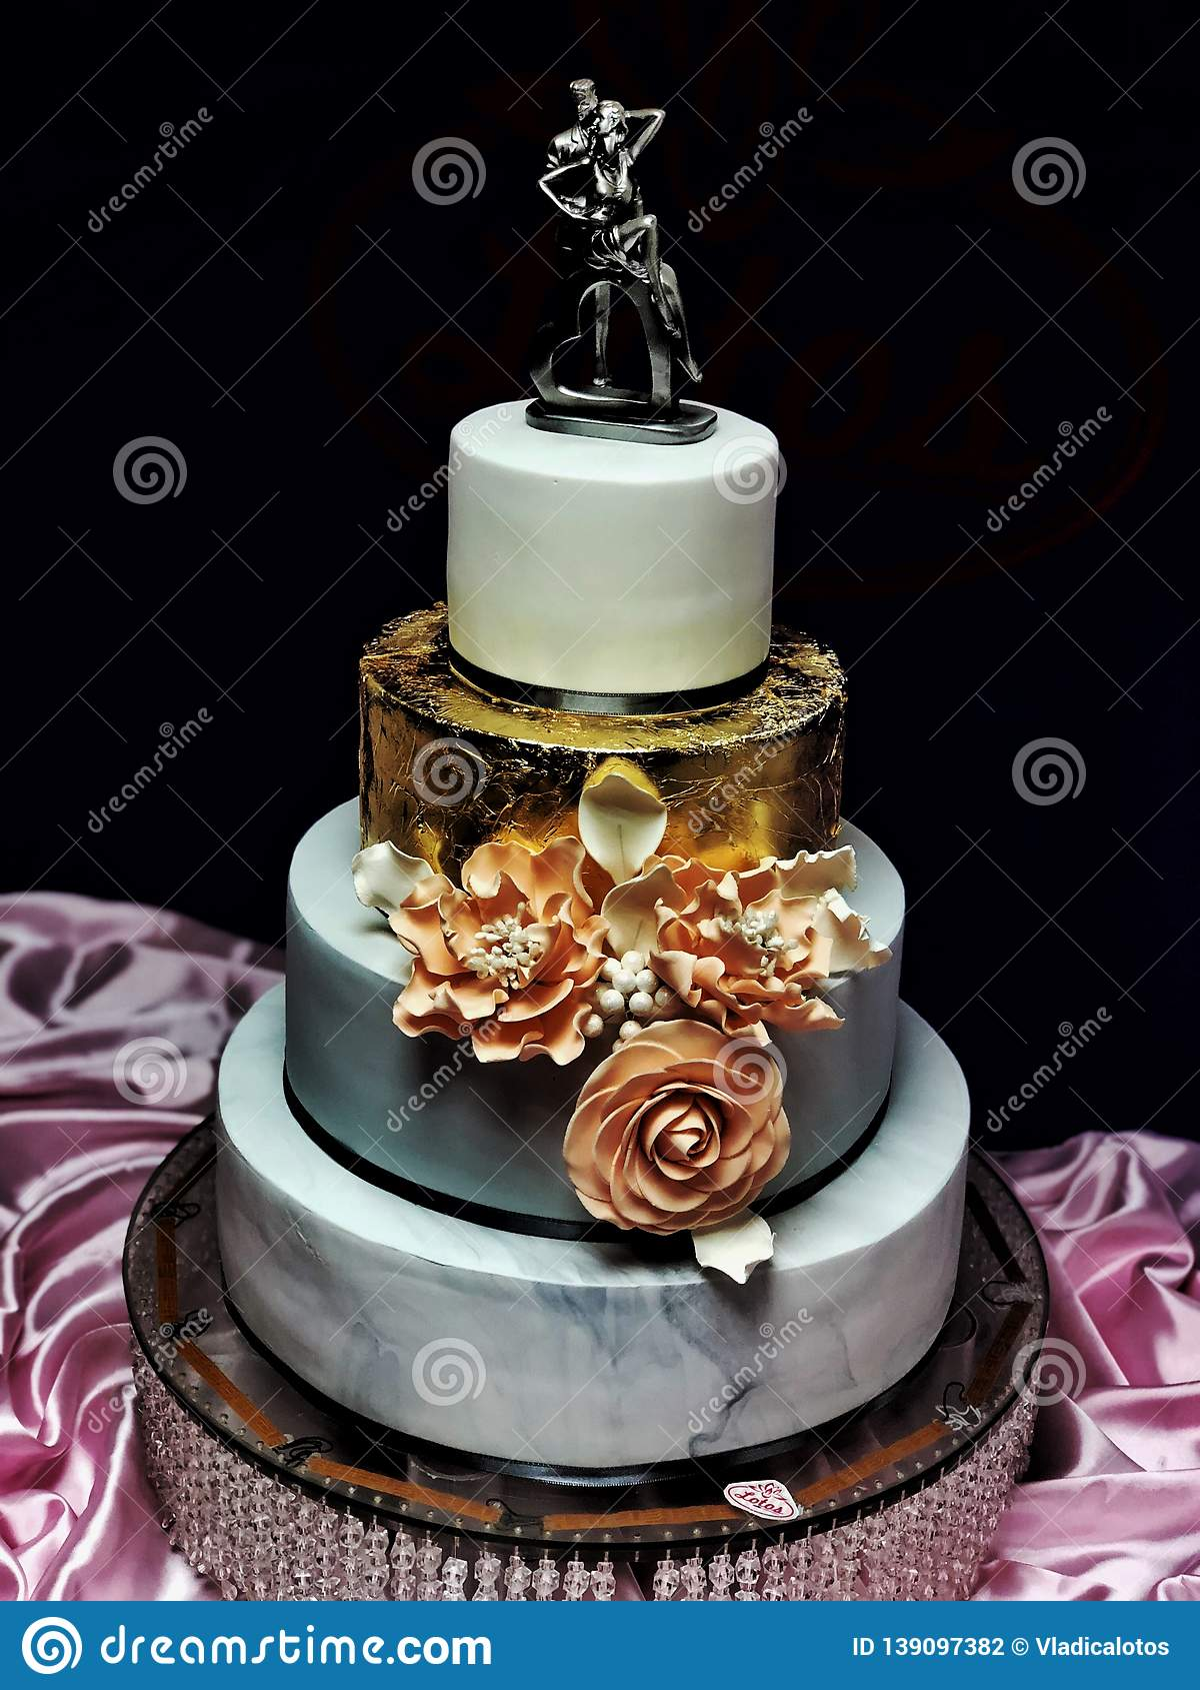 Magnificent Wedding Cake Day Luxury Cake Dream Sweet Royal Stock Photo Image Funny Birthday Cards Online Necthendildamsfinfo